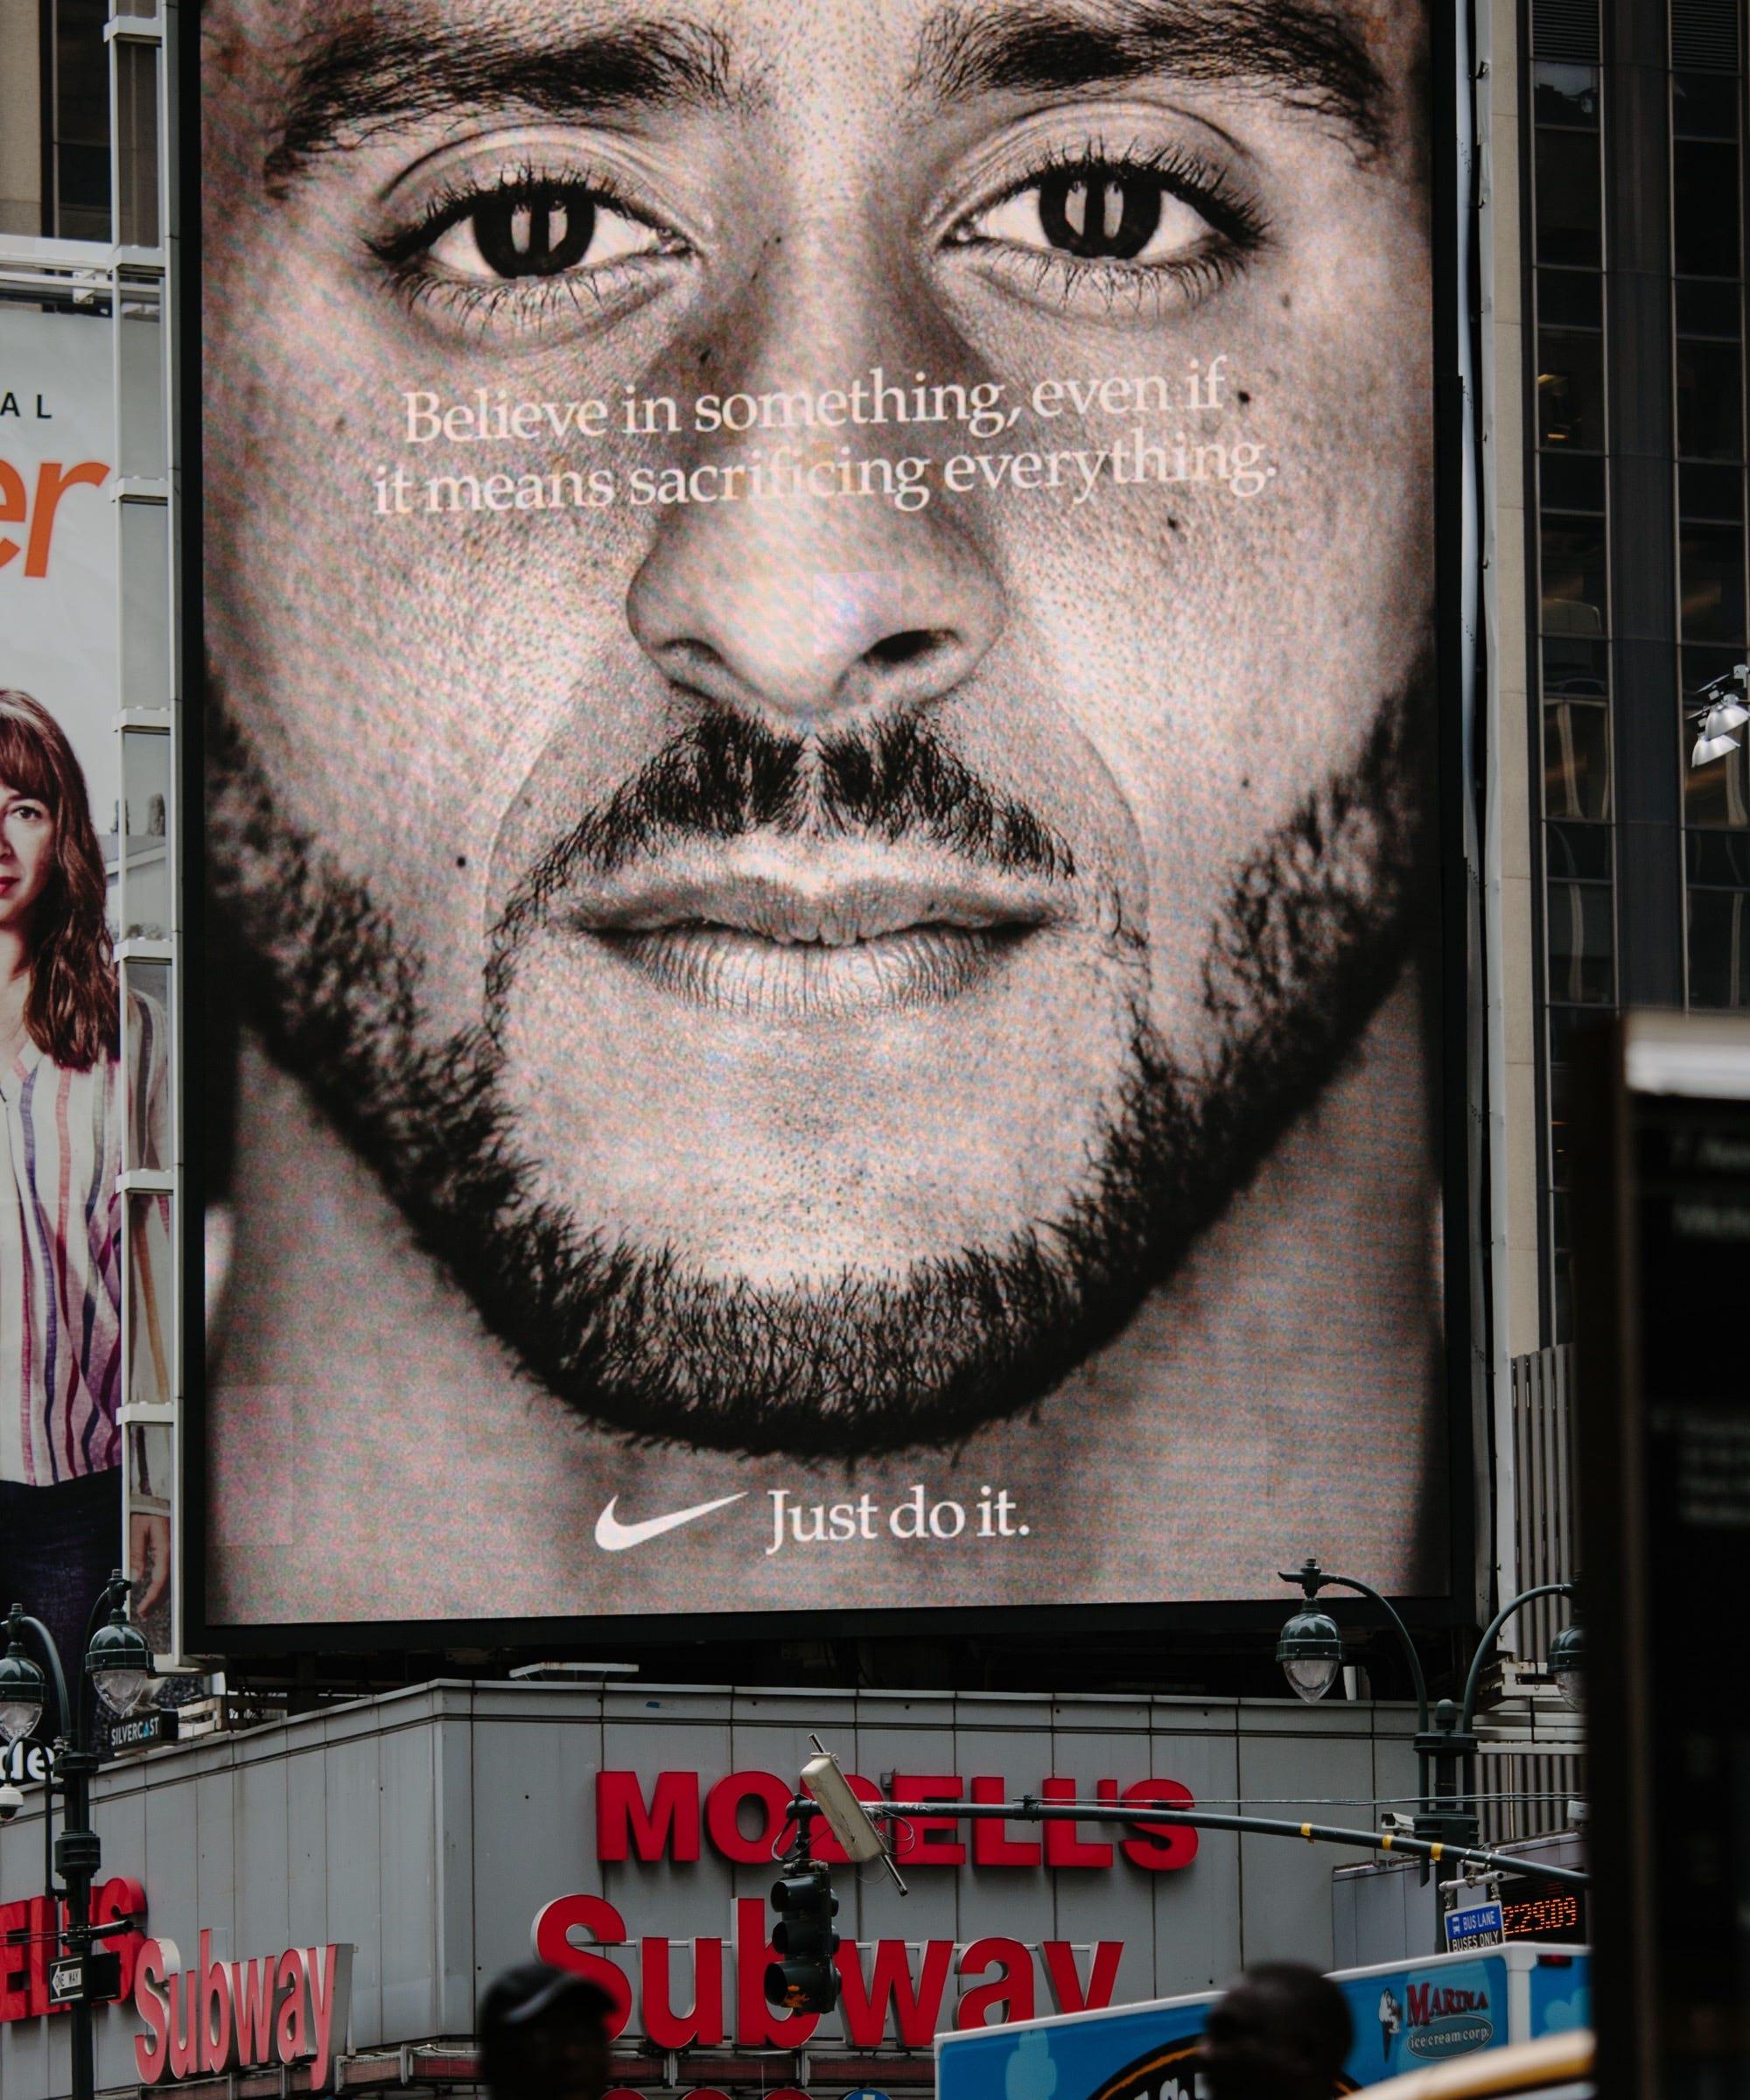 Nike Colin Kaepernick Ad Caused Sales Increase